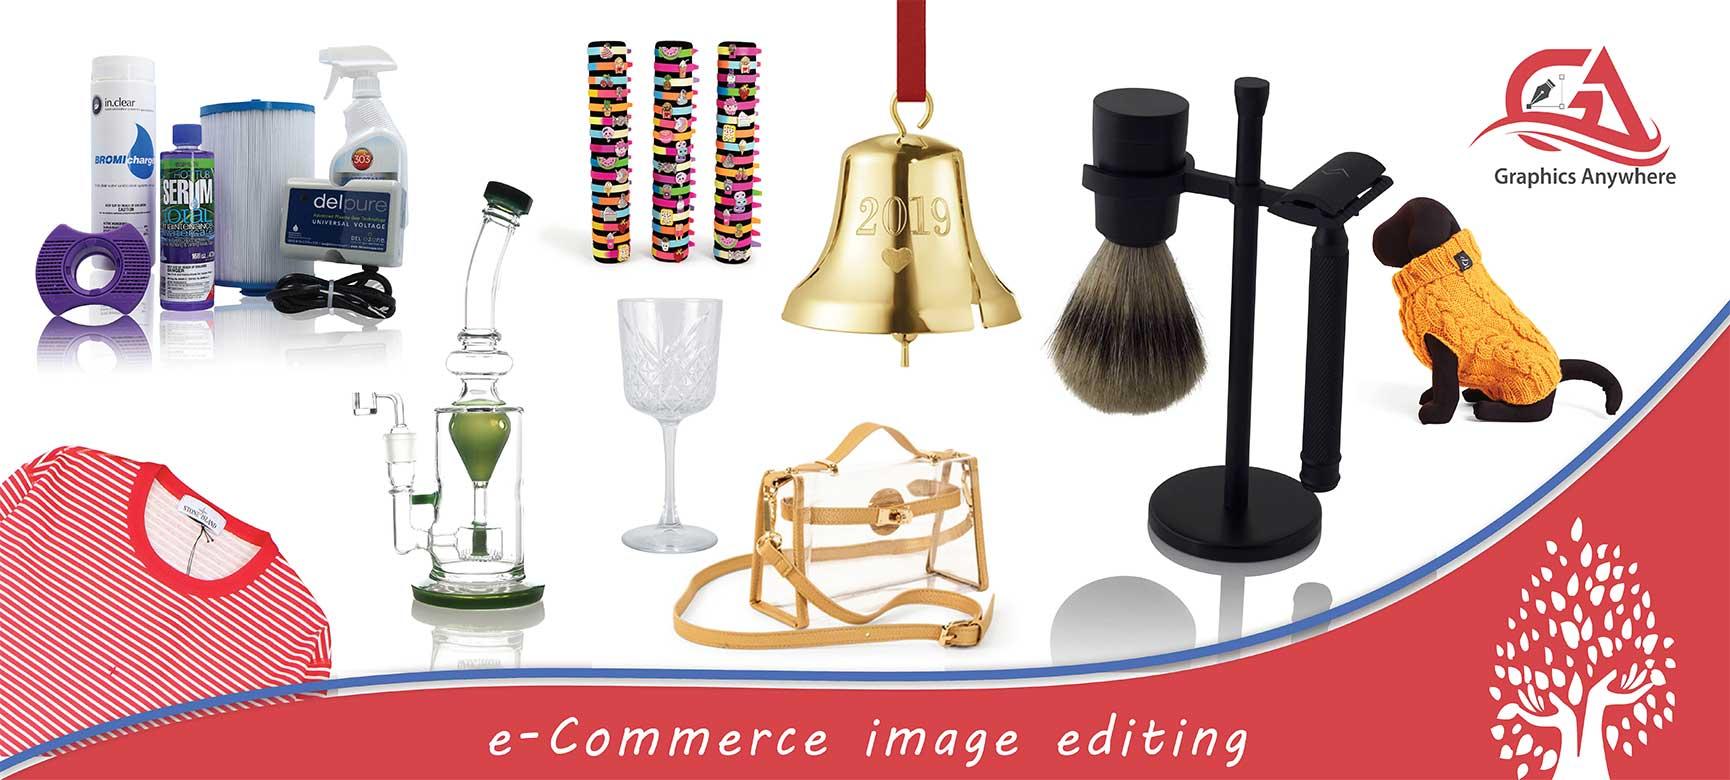 Ecommerce Image Editing Service